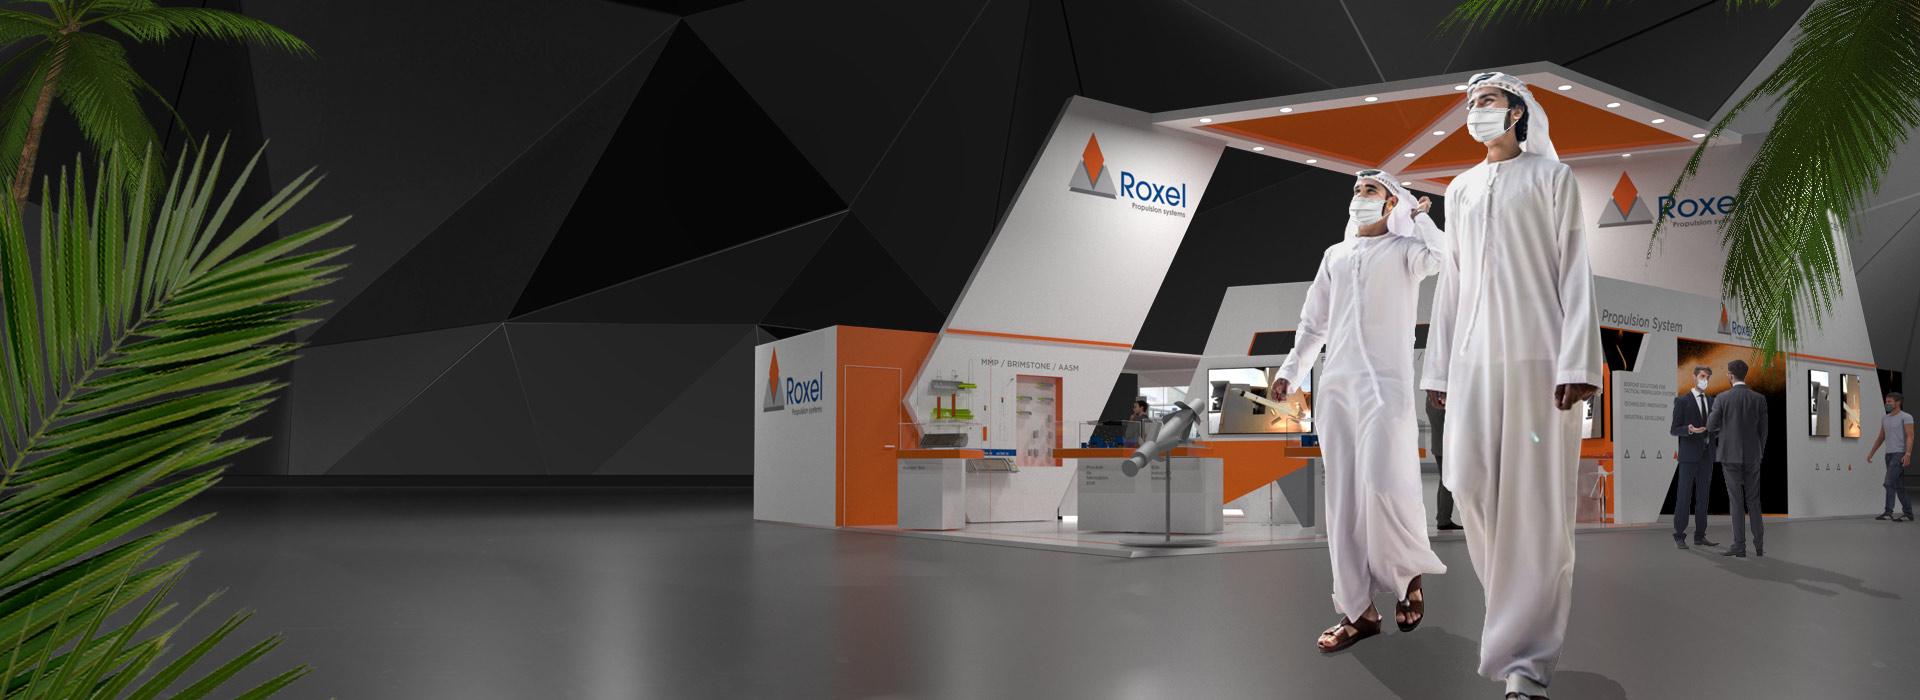 "Roxel @ <span style=""color: #F6672C;"">IDEX in Abu Dhabi</span>"